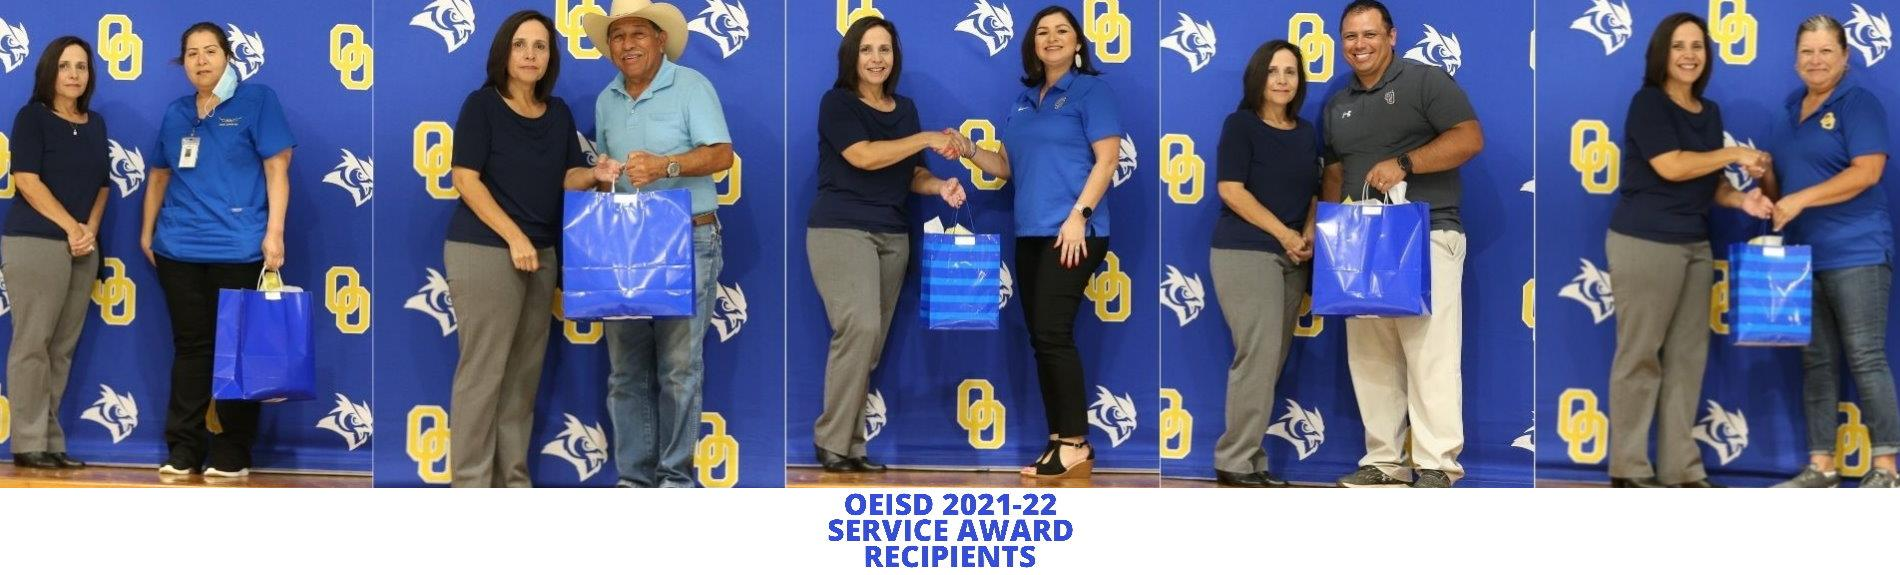 OEISD 2021-22 Service Award Recipients